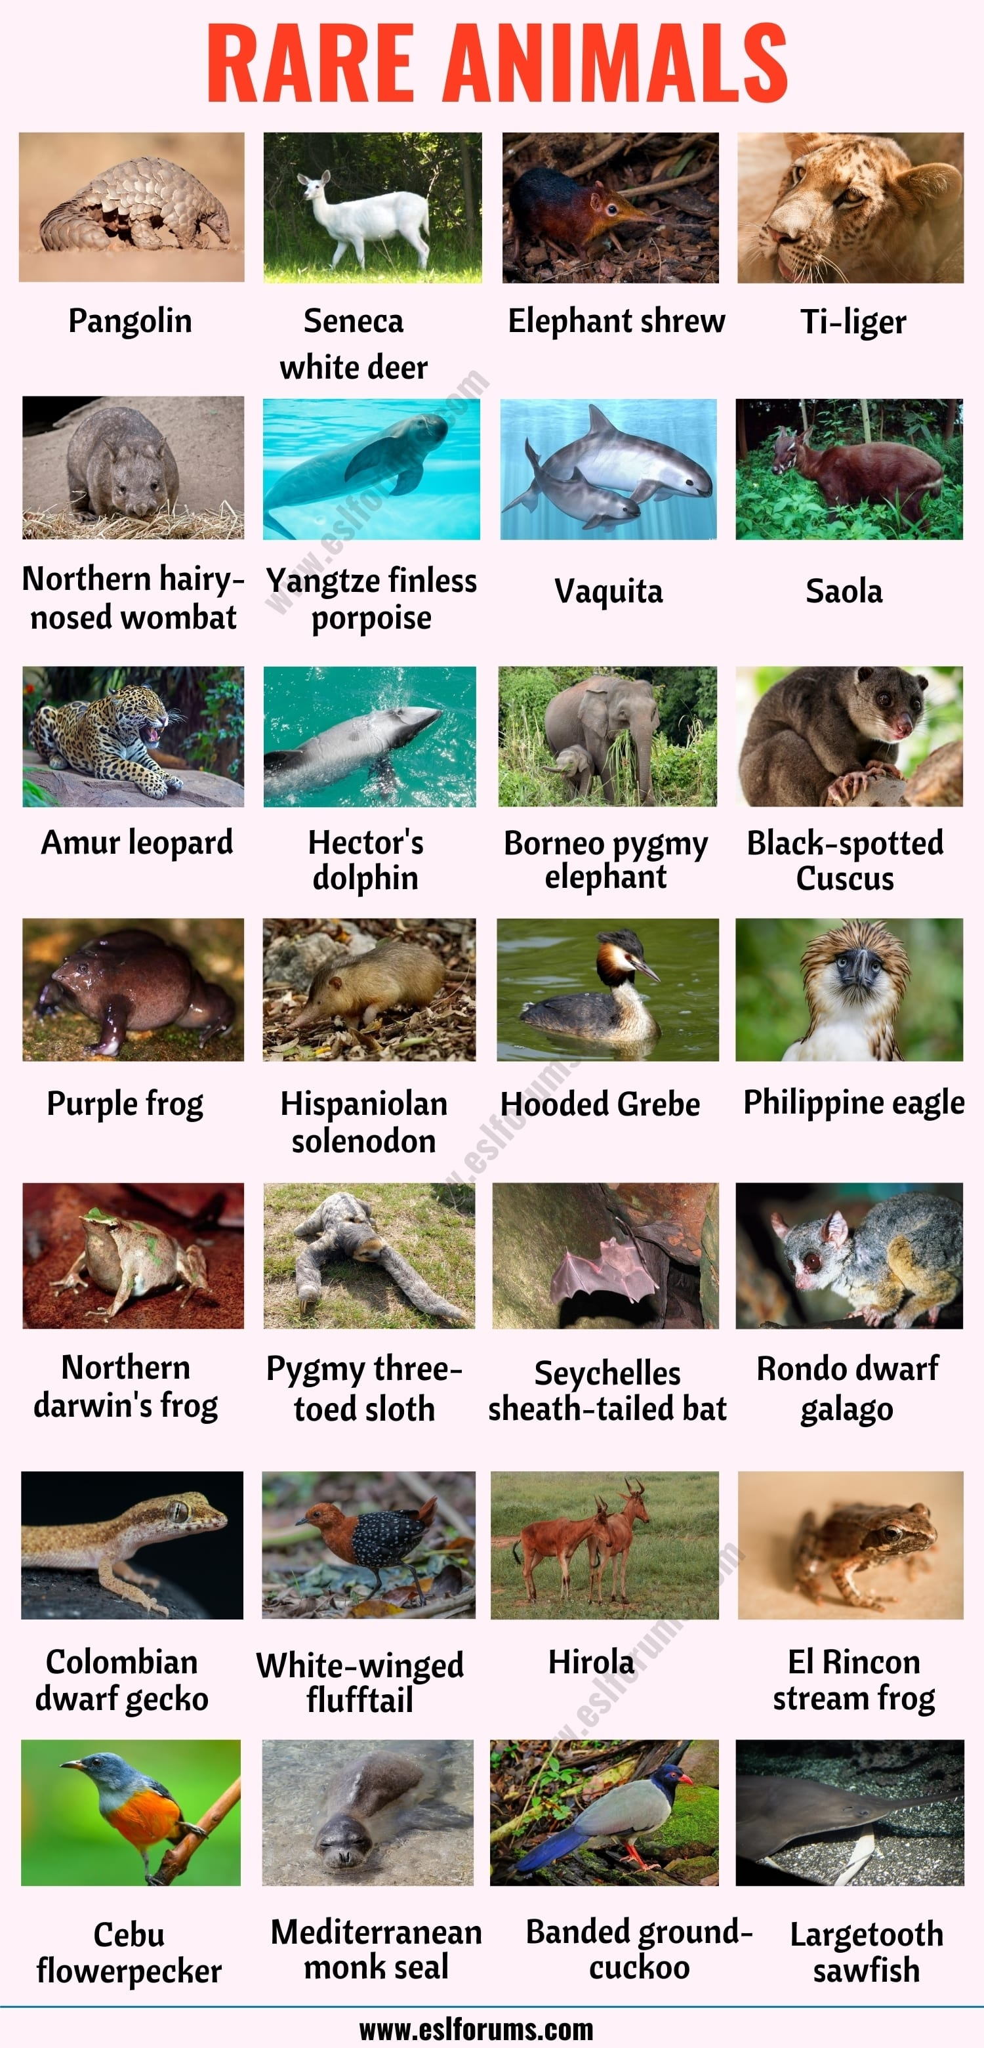 Rare Animals: The 30 Rarest Animals in the World!